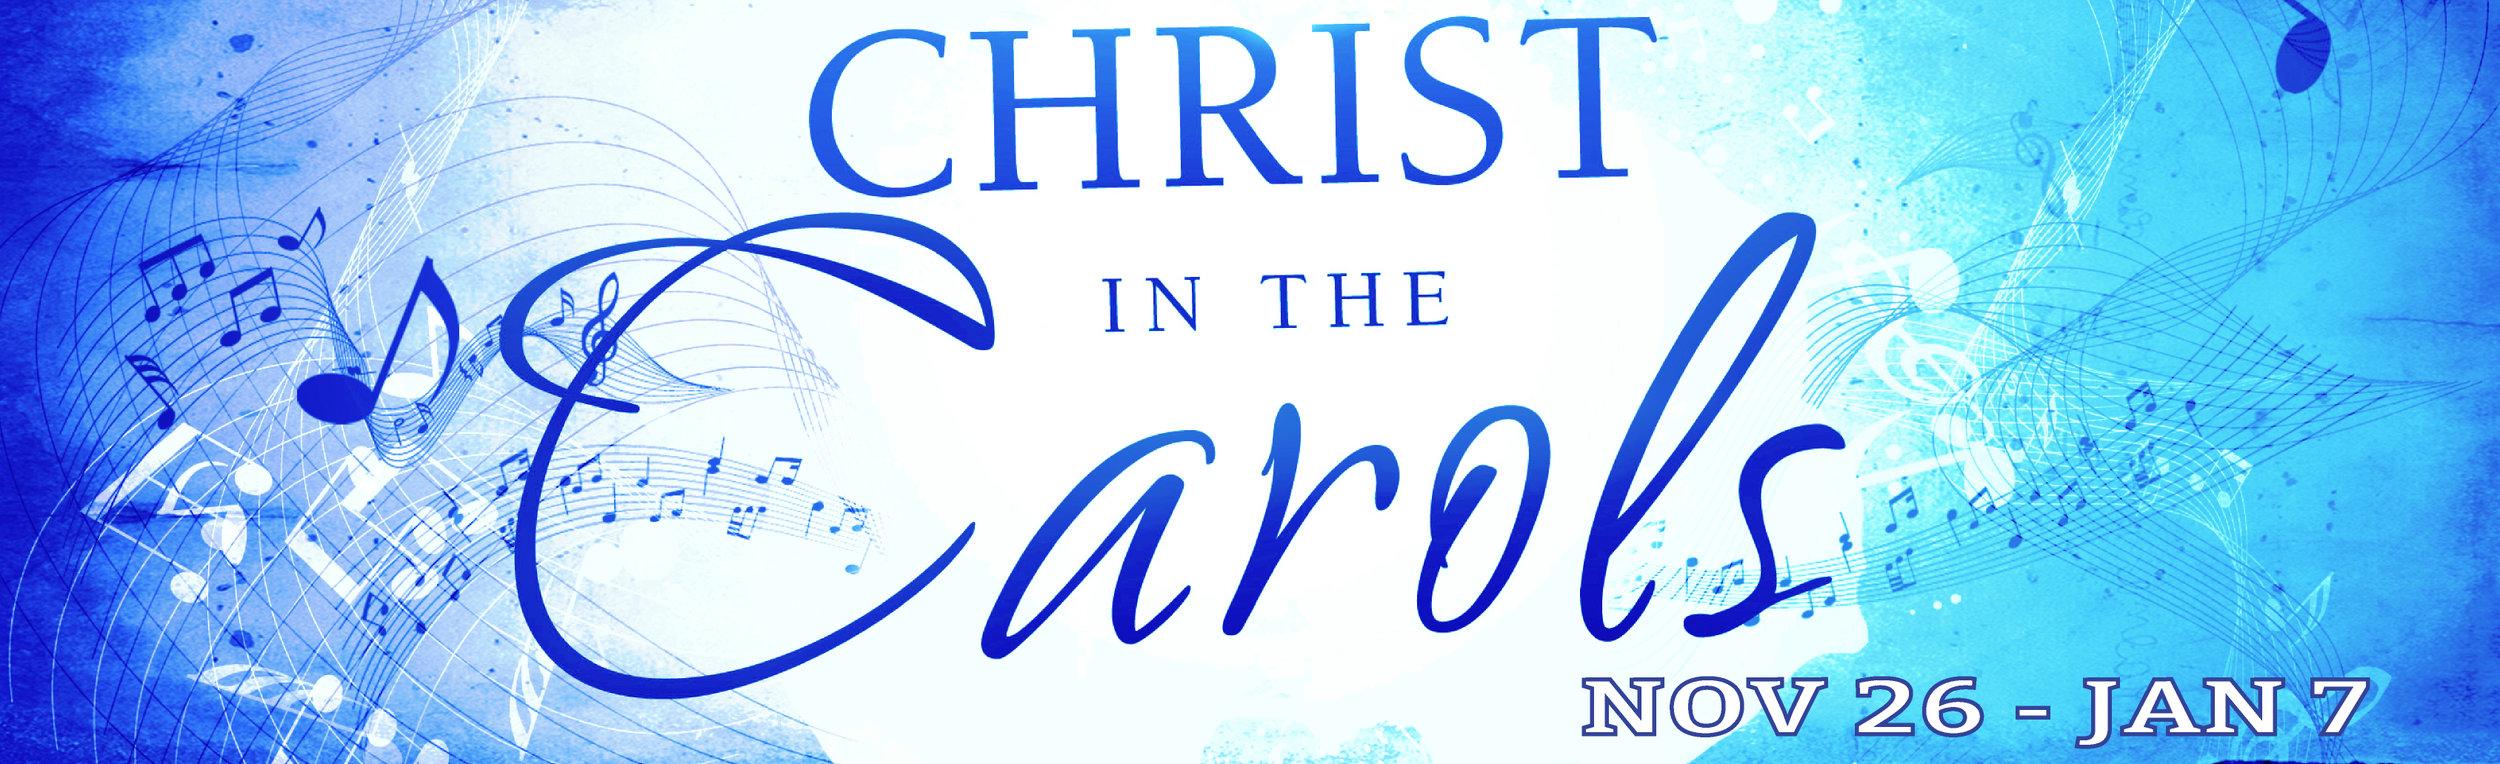 Christ-in-the-Carols_web-banner.jpg